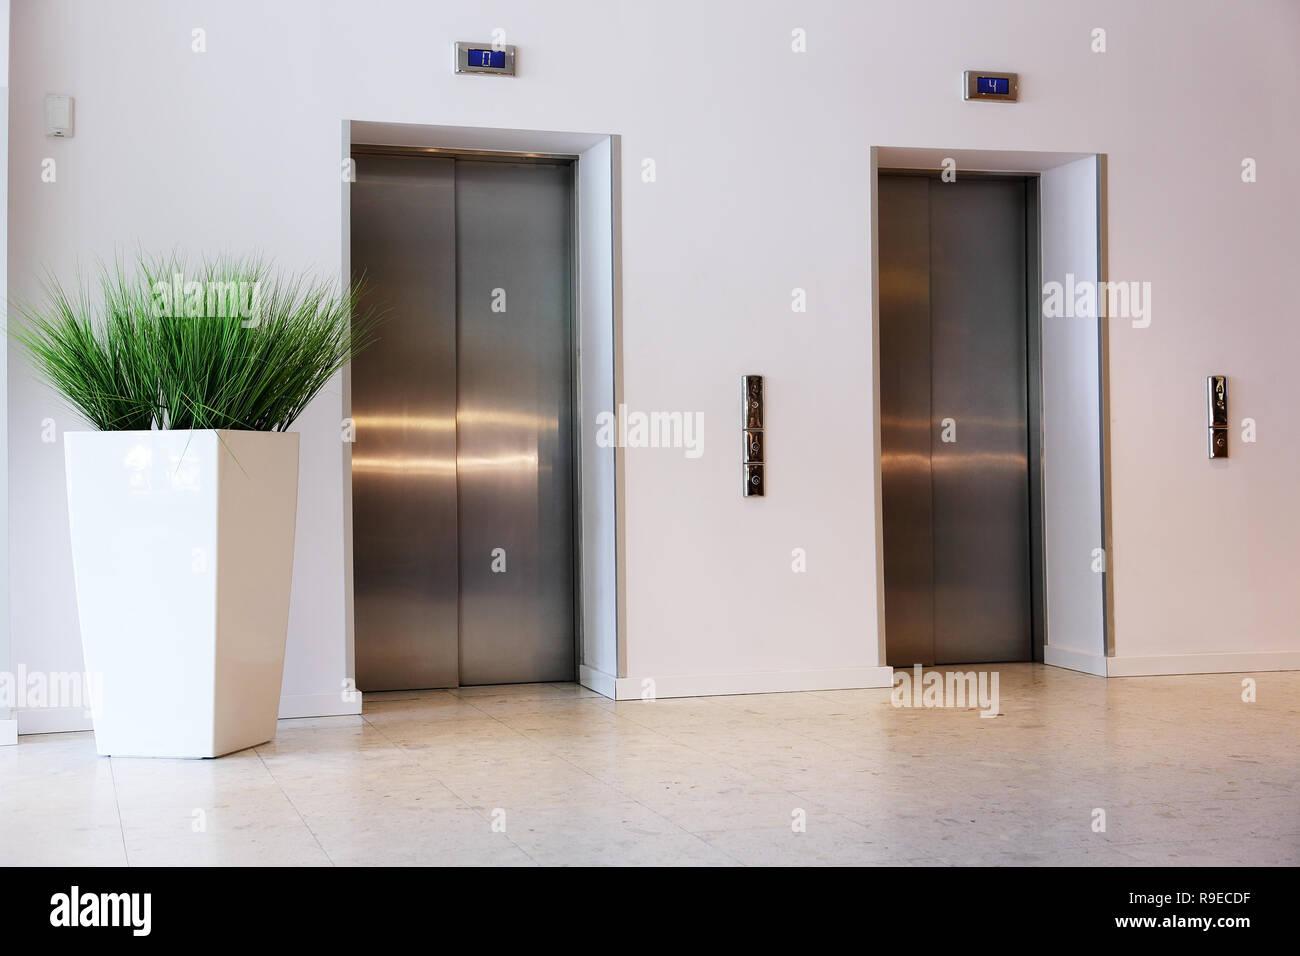 lift with metal door for hotel guests - Stock Image